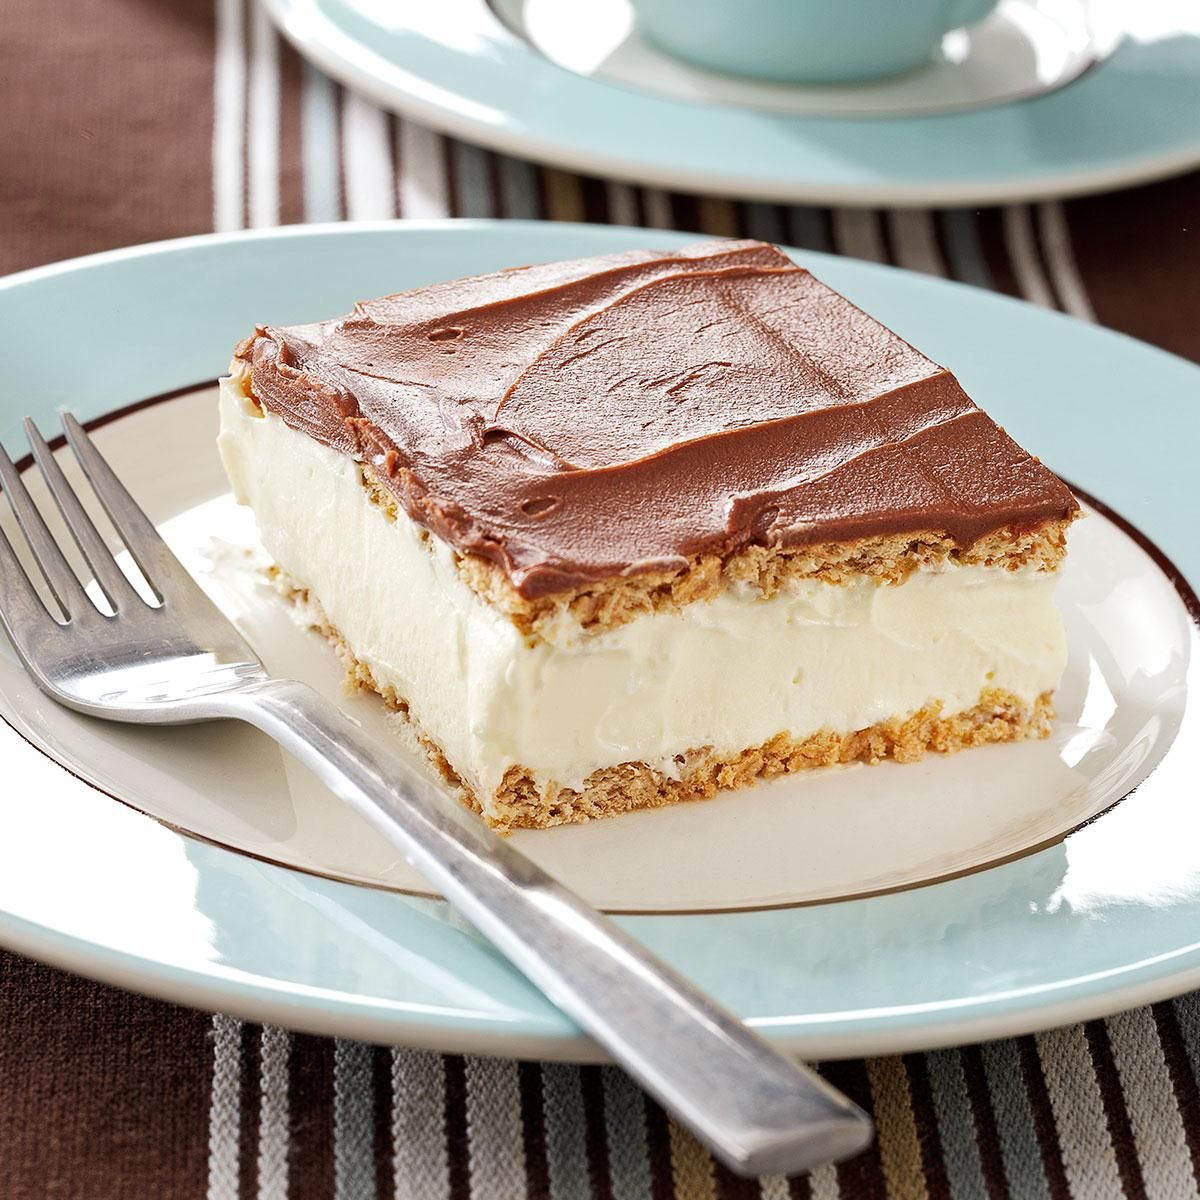 Thelma S Chocolate Eclair Recipe Chocolate Eclair Recipe